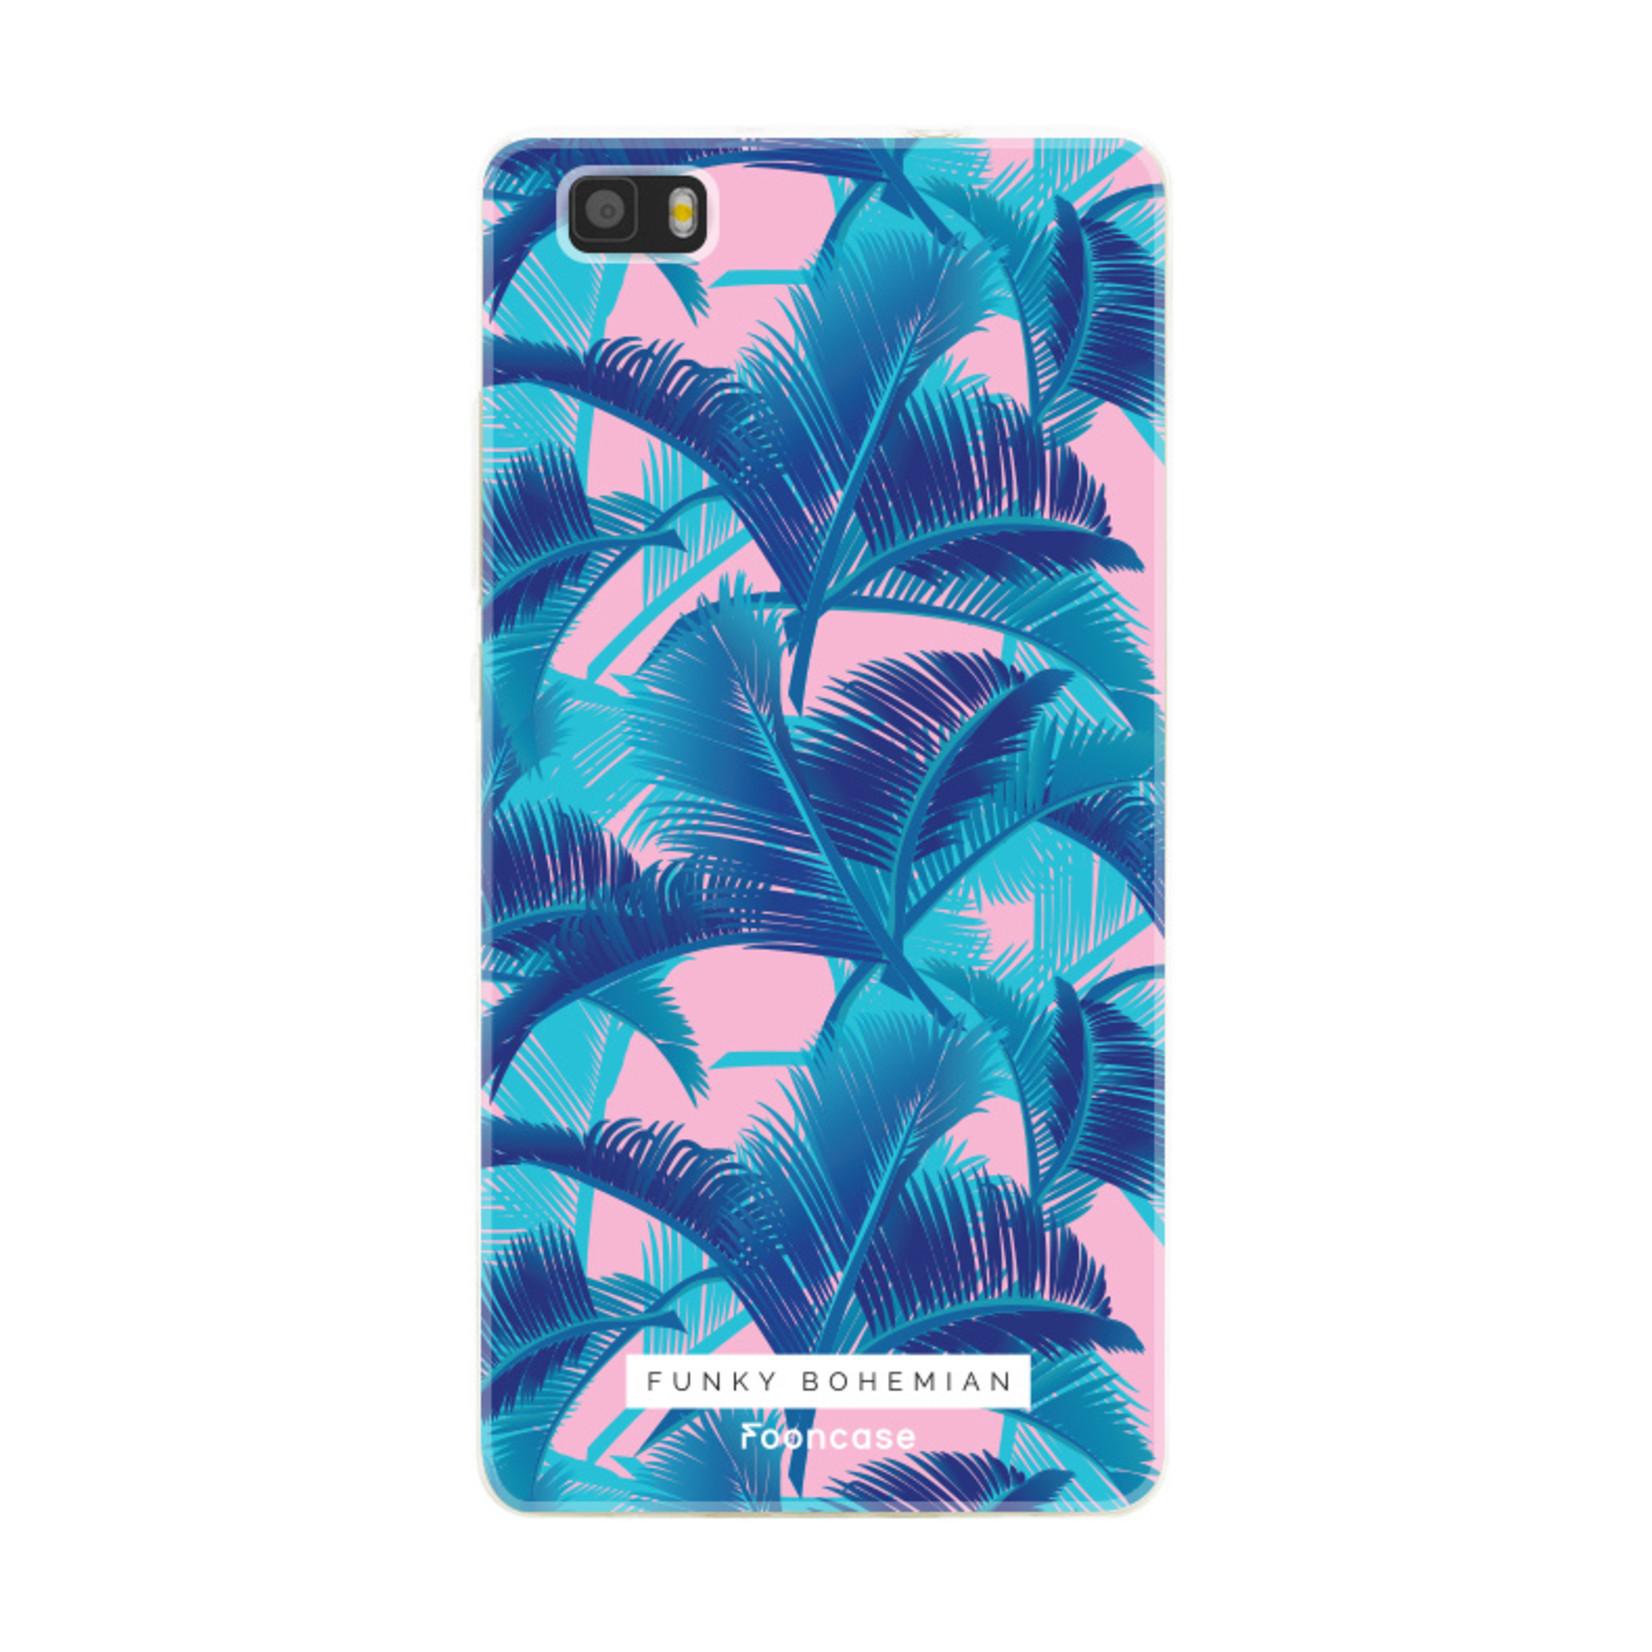 FOONCASE Huawei P8 Lite 2016 hoesje TPU Soft Case - Back Cover - Funky Bohemian / Blauw Roze Bladeren